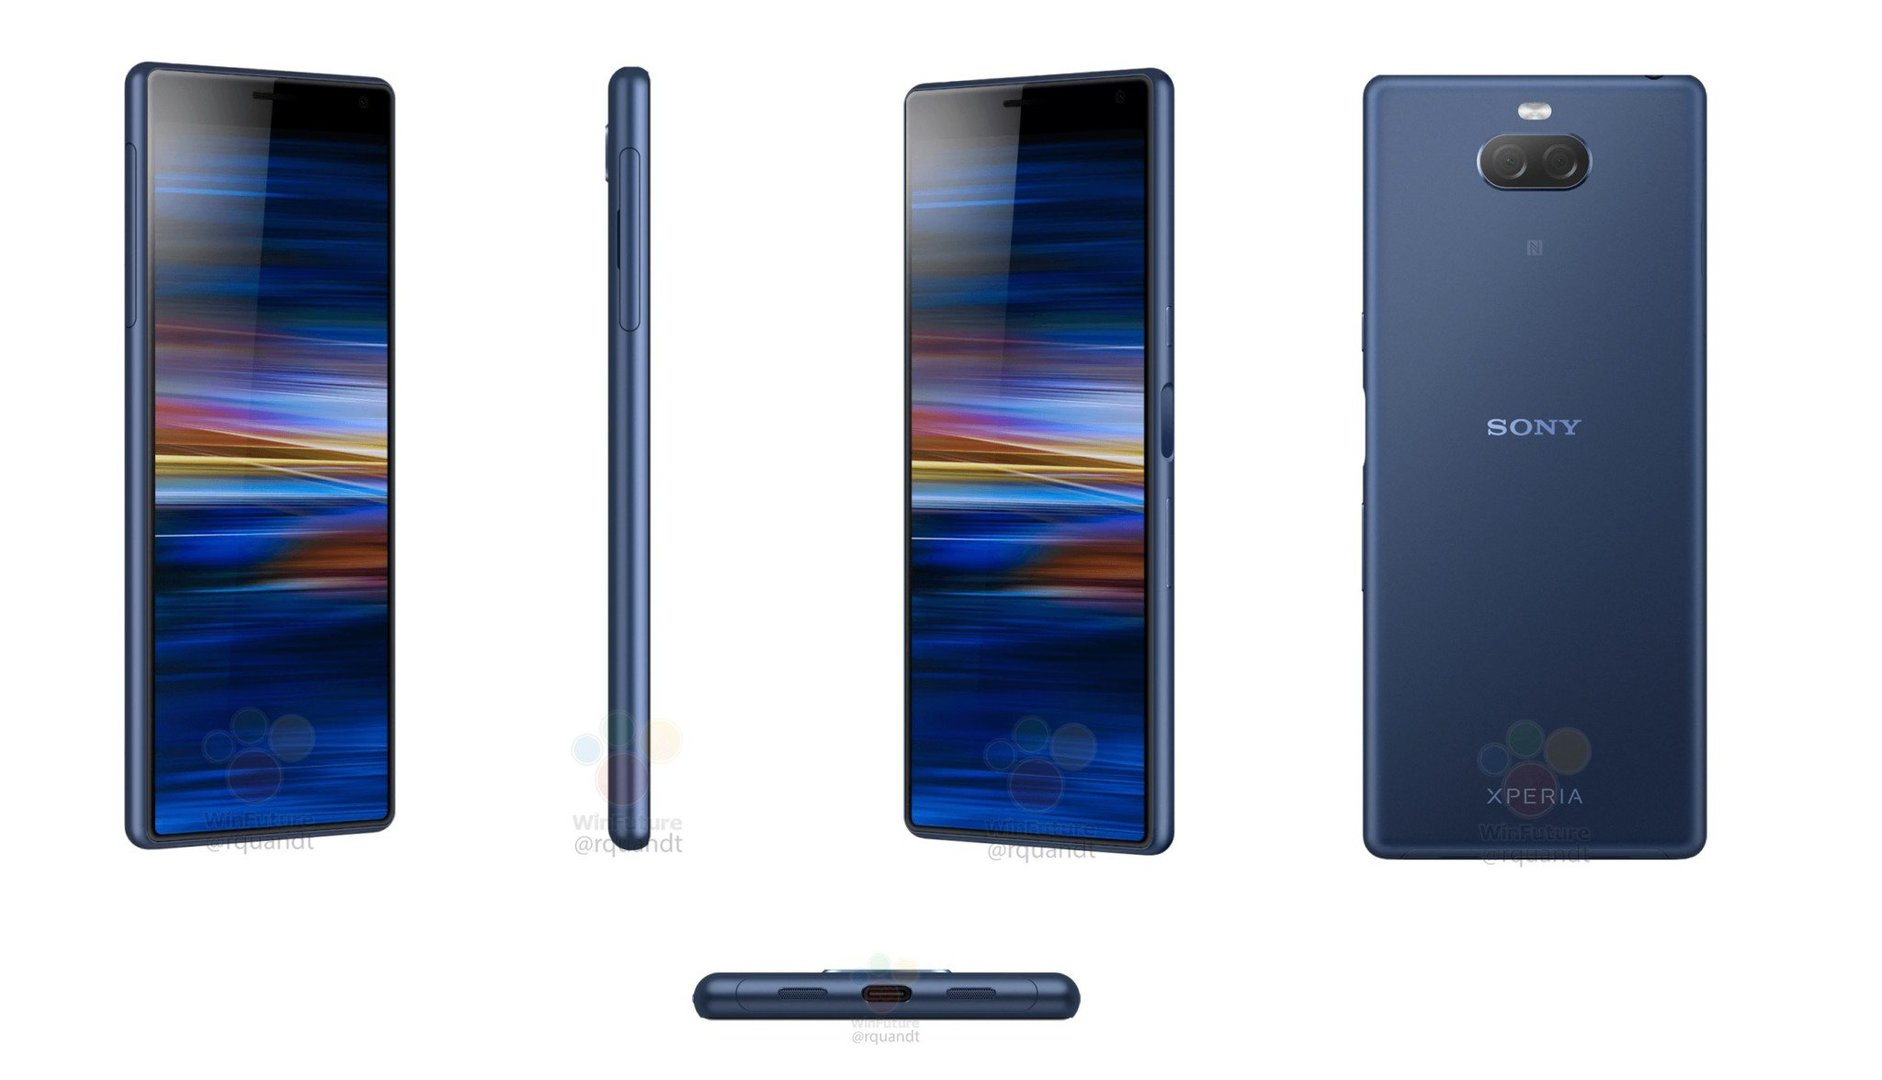 Смартфон среднего класса Sony Xperia XA3 будет безрамочным до нижней грани дисплея